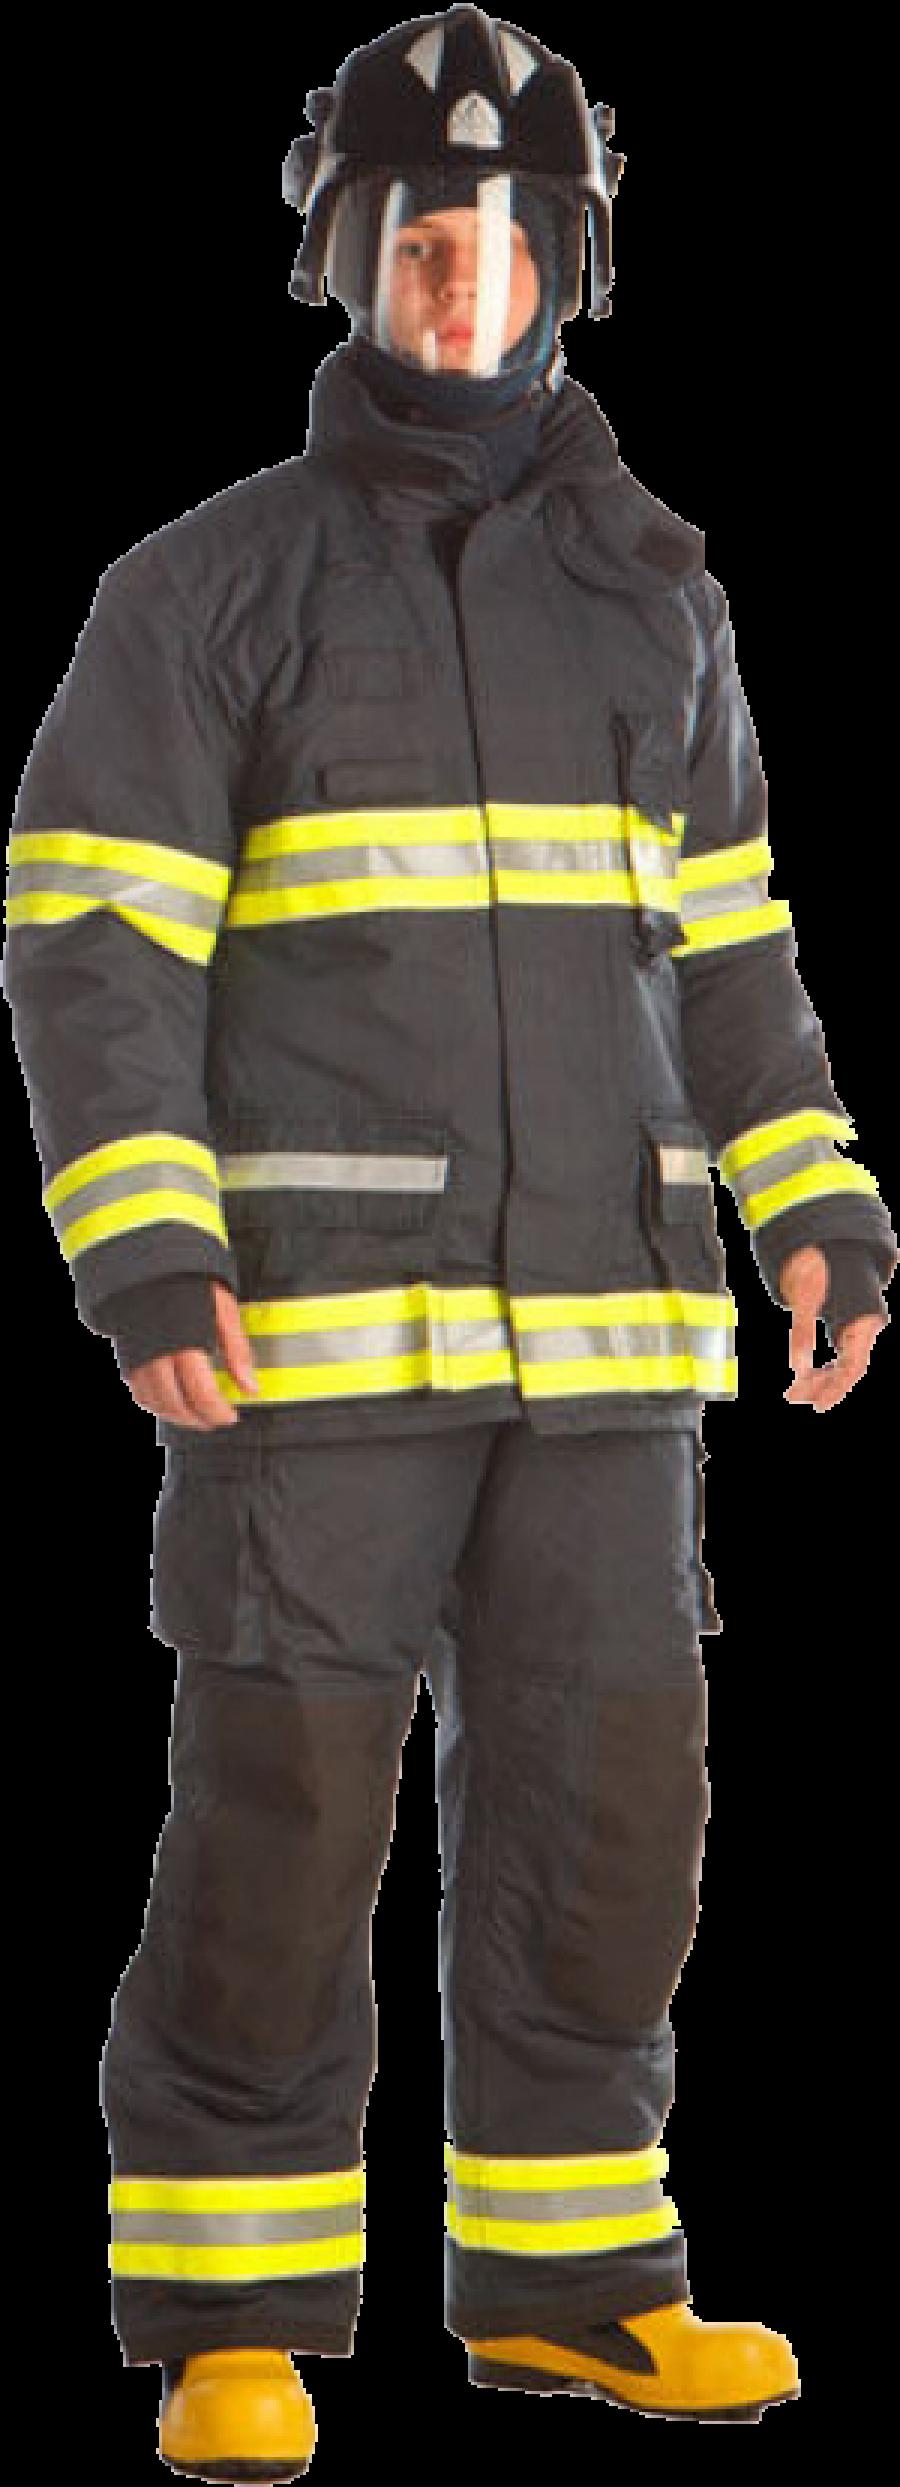 Fireman HD PNG - 96779